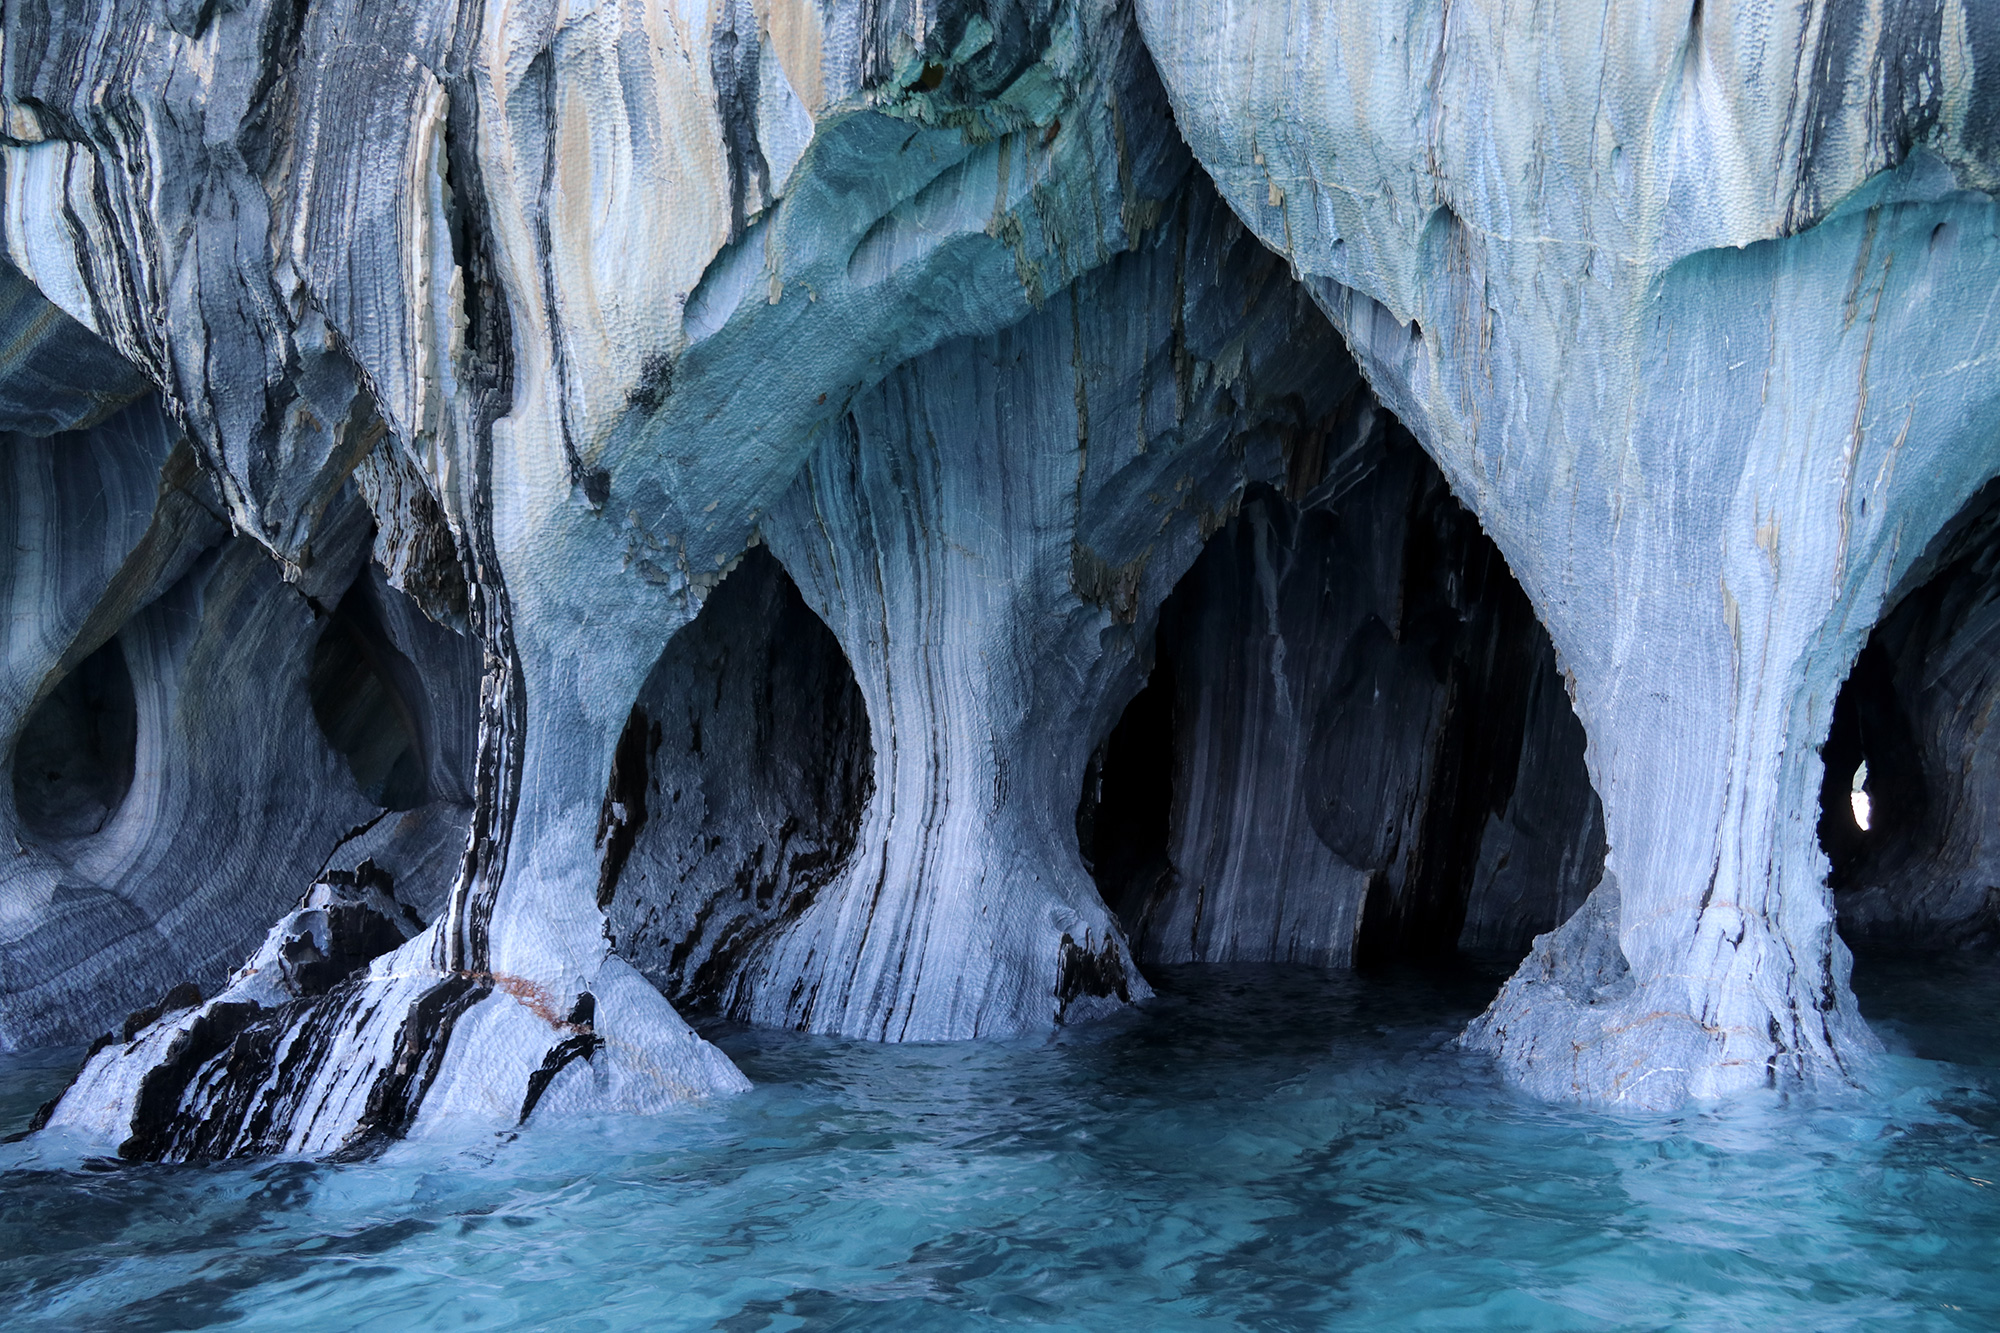 Reisverslag Patagonië - Marble Caves